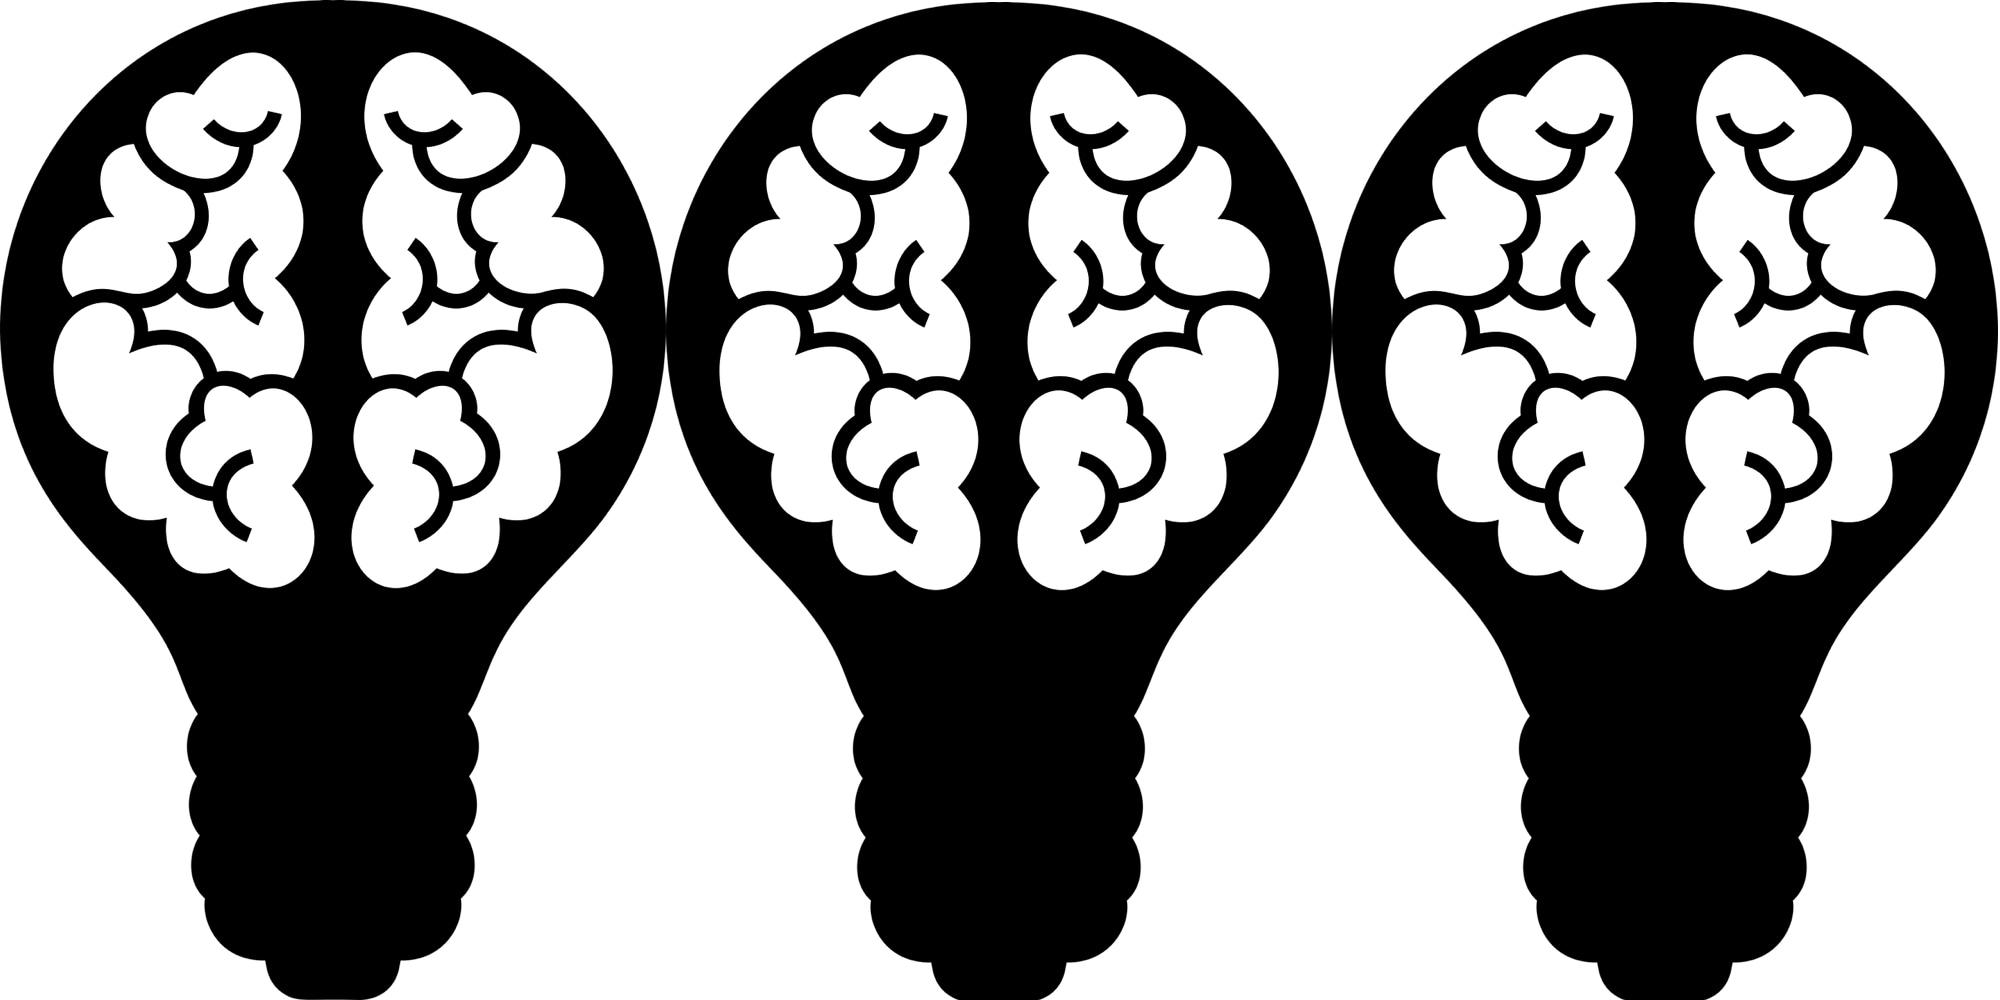 OptimHum - Optimizing Human Computation in Citizen Science